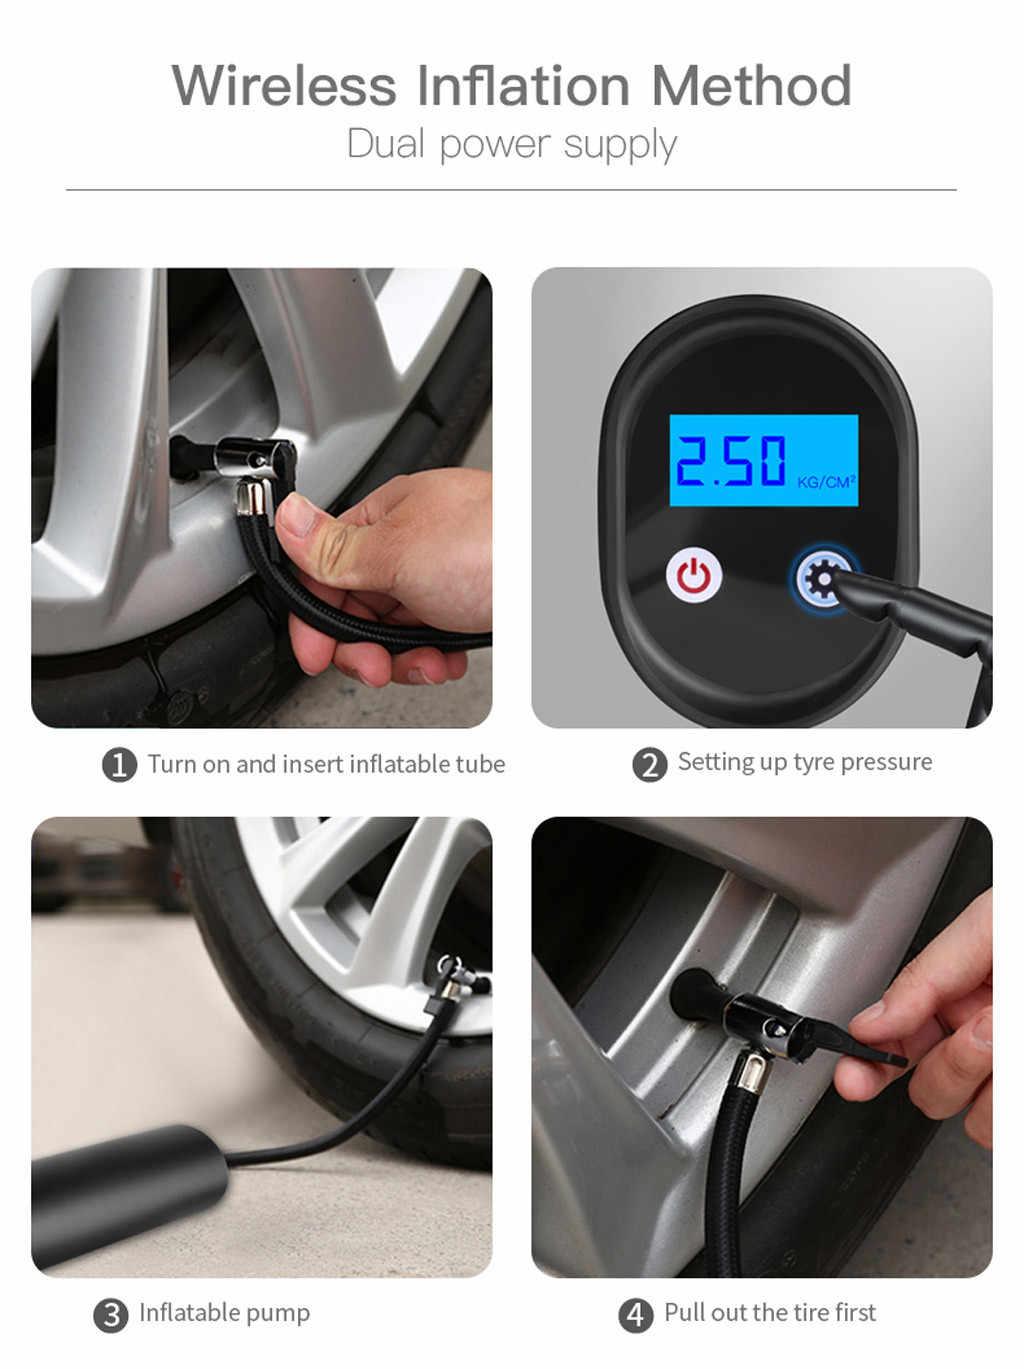 INFLATABLE ปั๊มสายชาร์จรถยนต์ INFLATABLE INTERFACE แบบพกพาไร้สายแบบพกพาเครื่องอัดอากาศ Mini Inflator #916g40